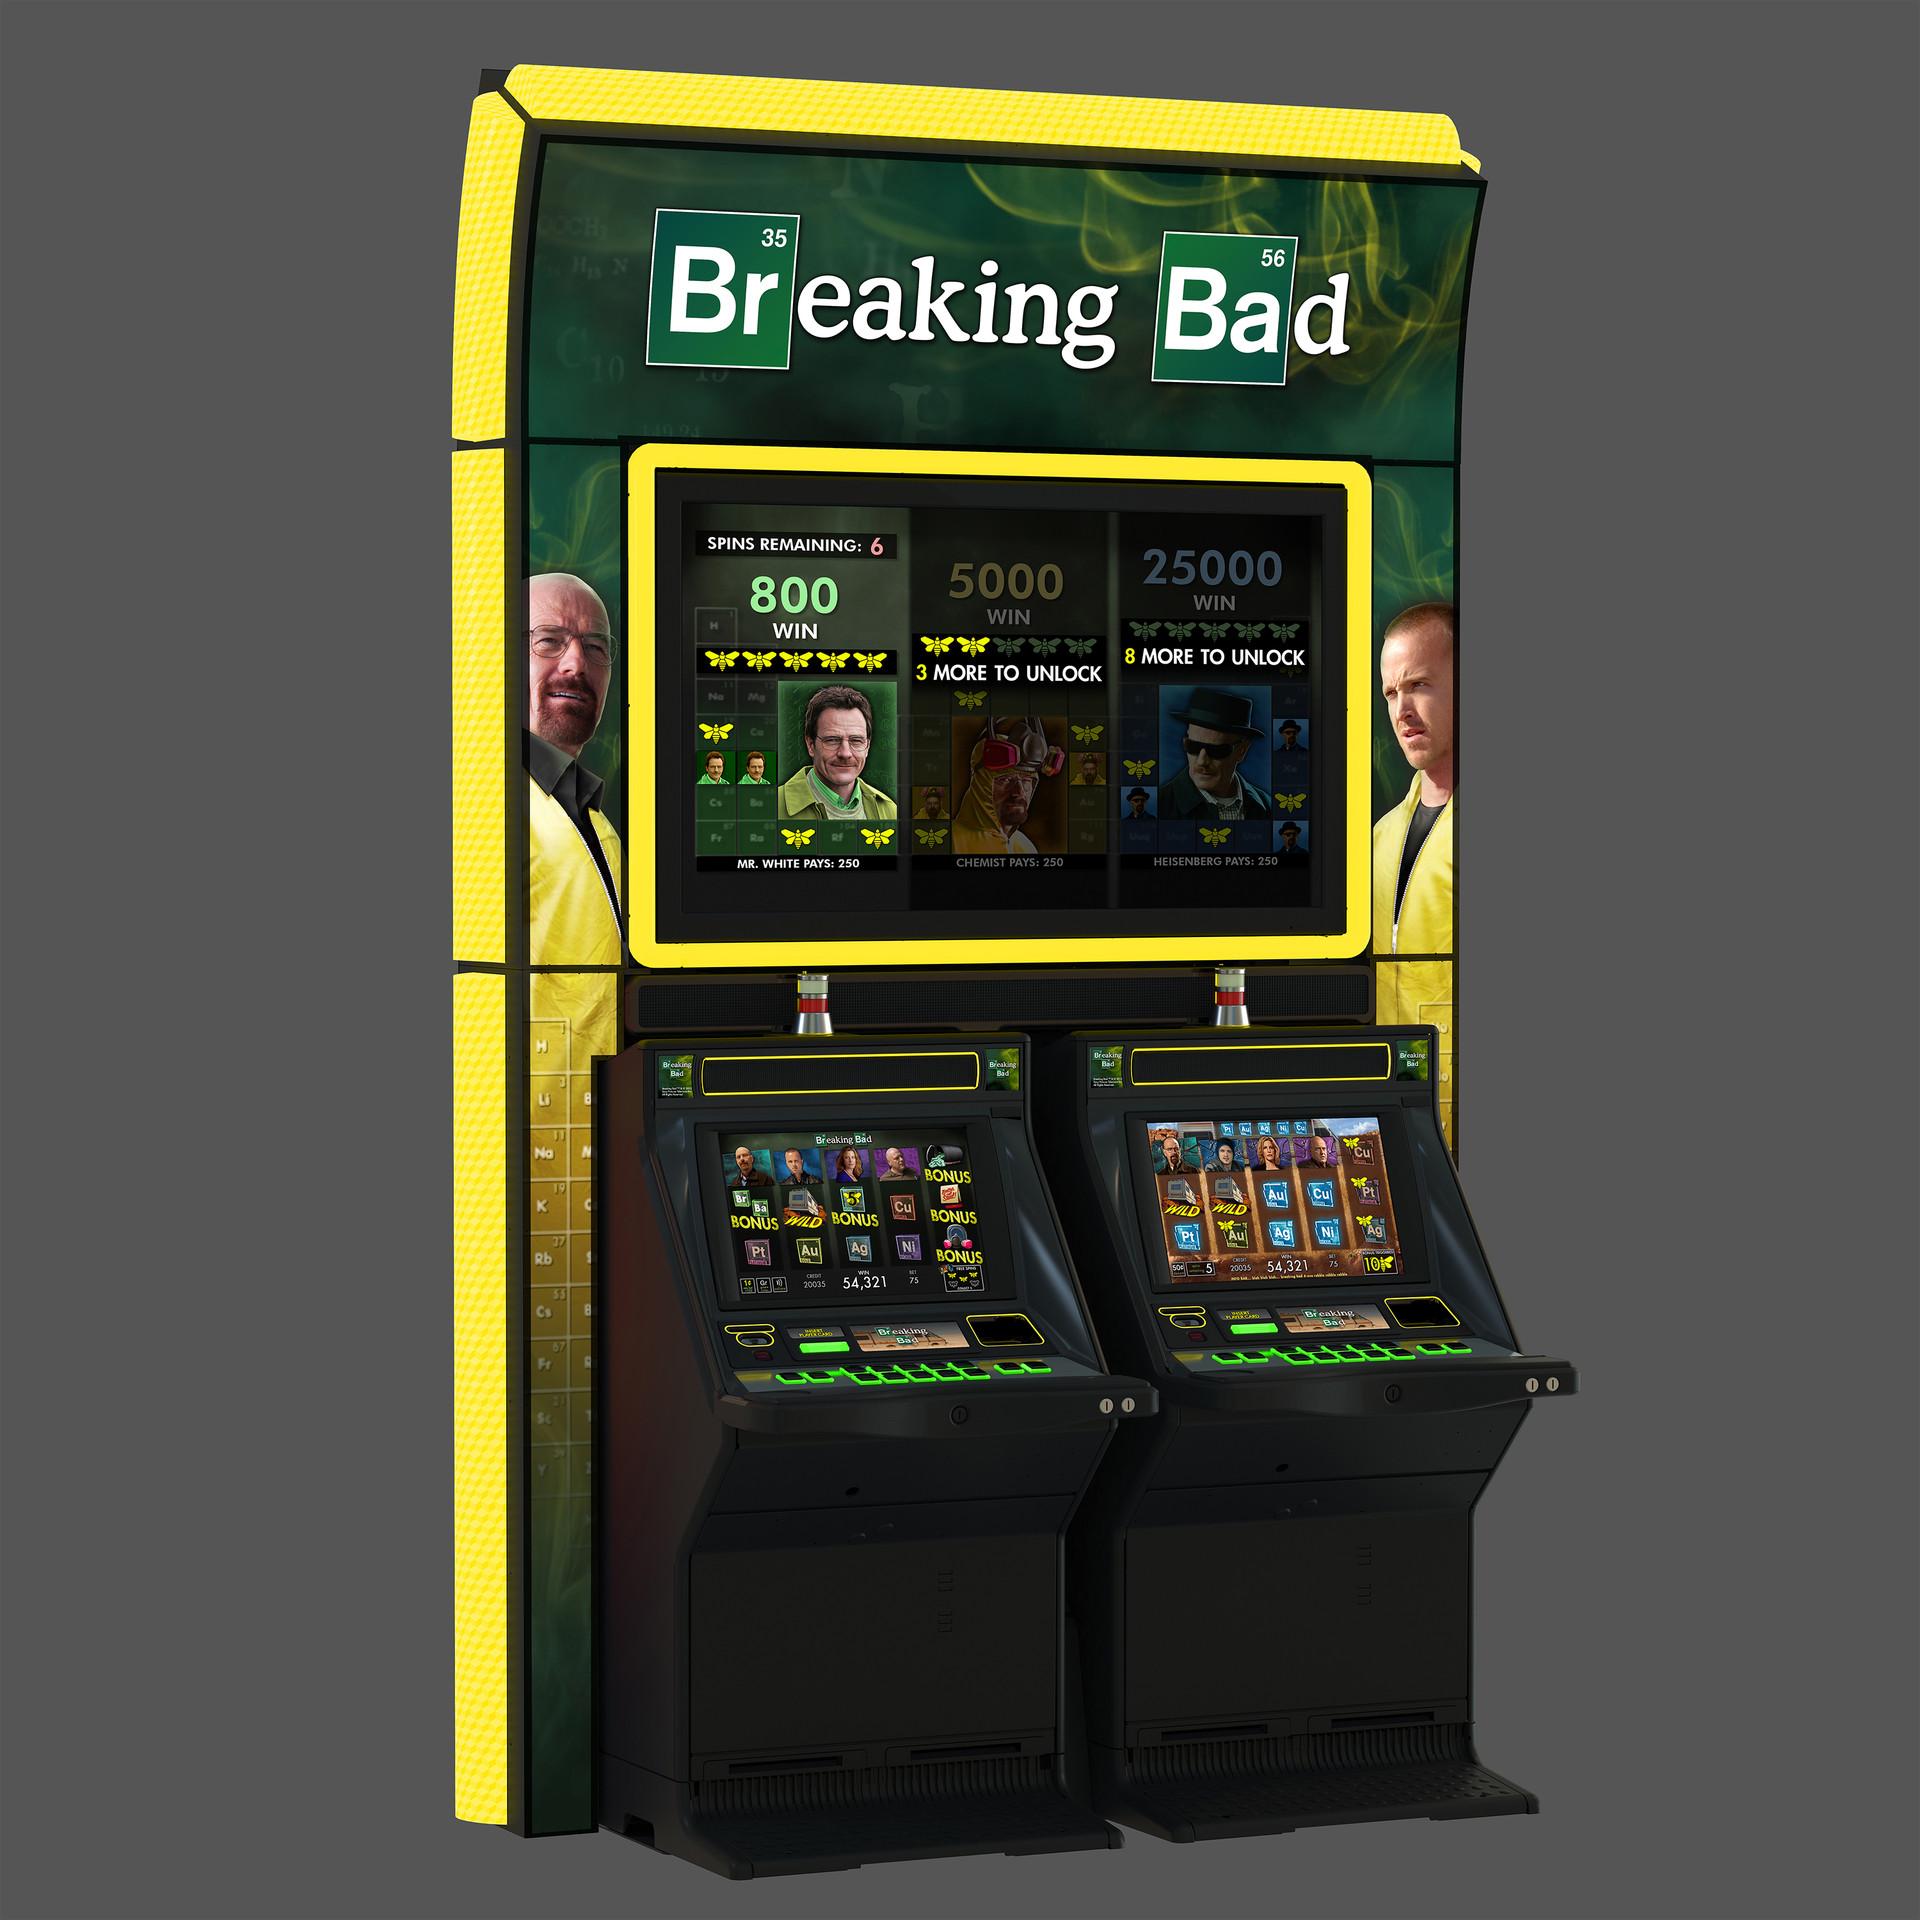 Cabinet design for Breaking Bad.